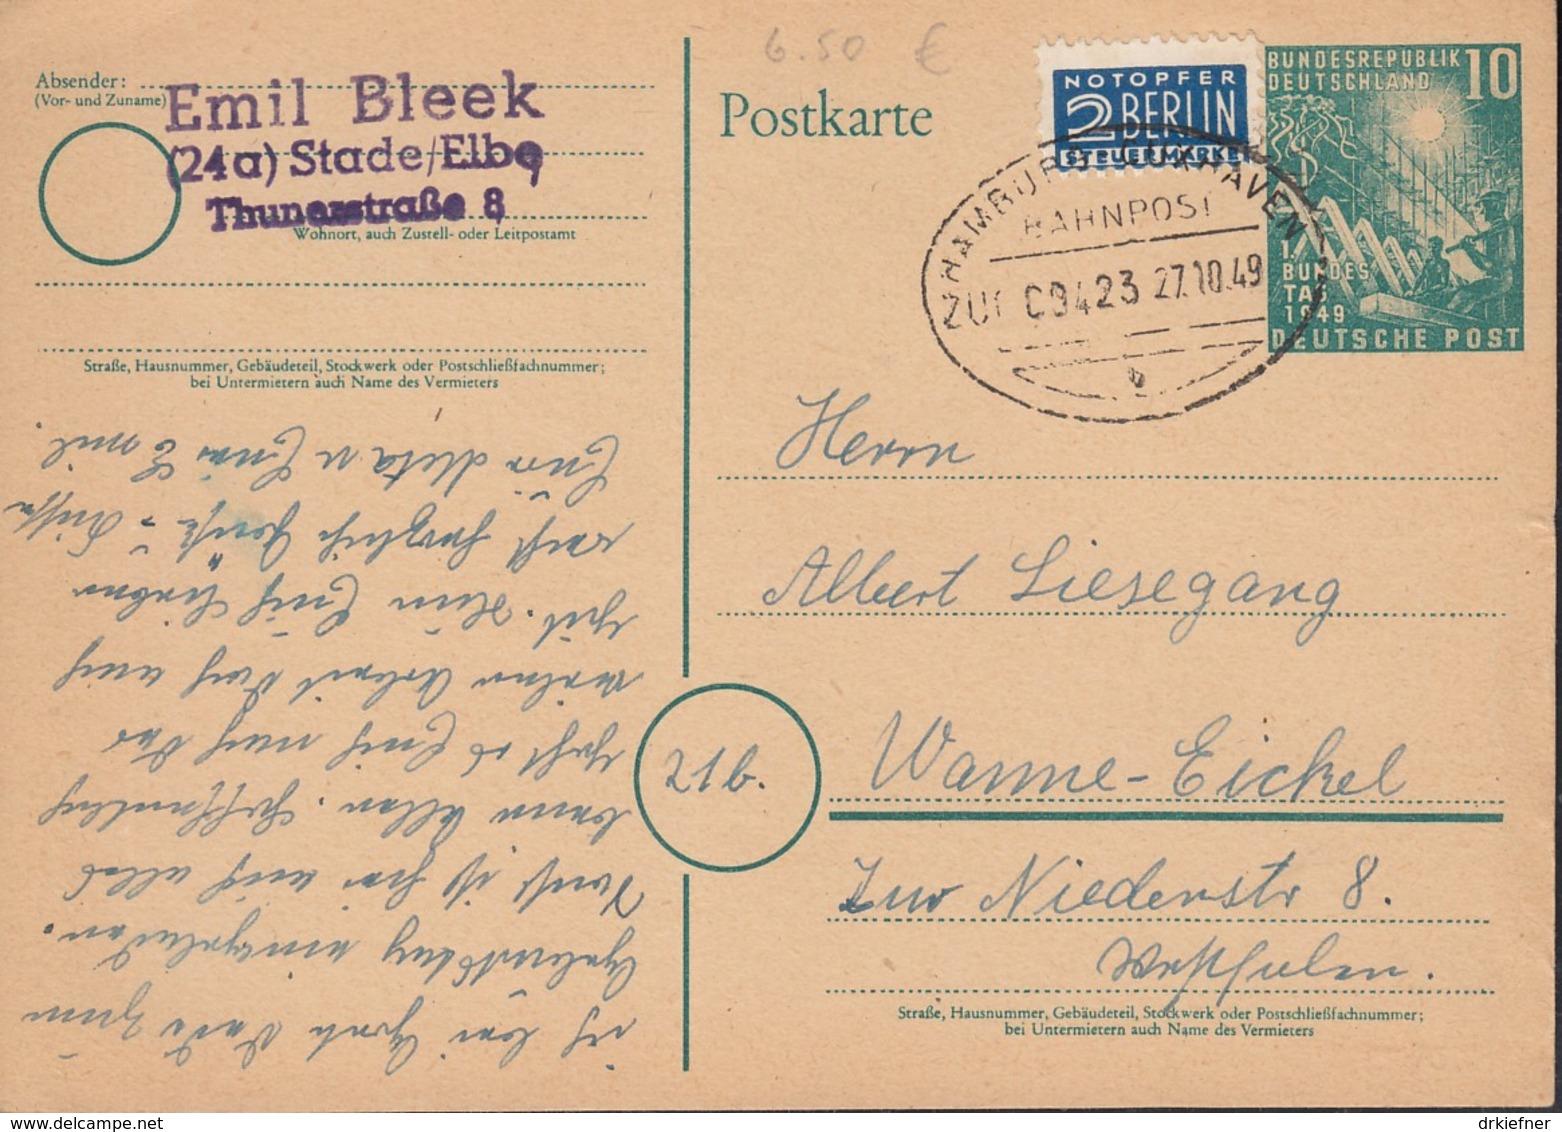 BRD PSo 1, Mit Bahnpost Stempel: Hamburg-Cuxhaven ZUG 00423 27.10.1949 - [7] West-Duitsland